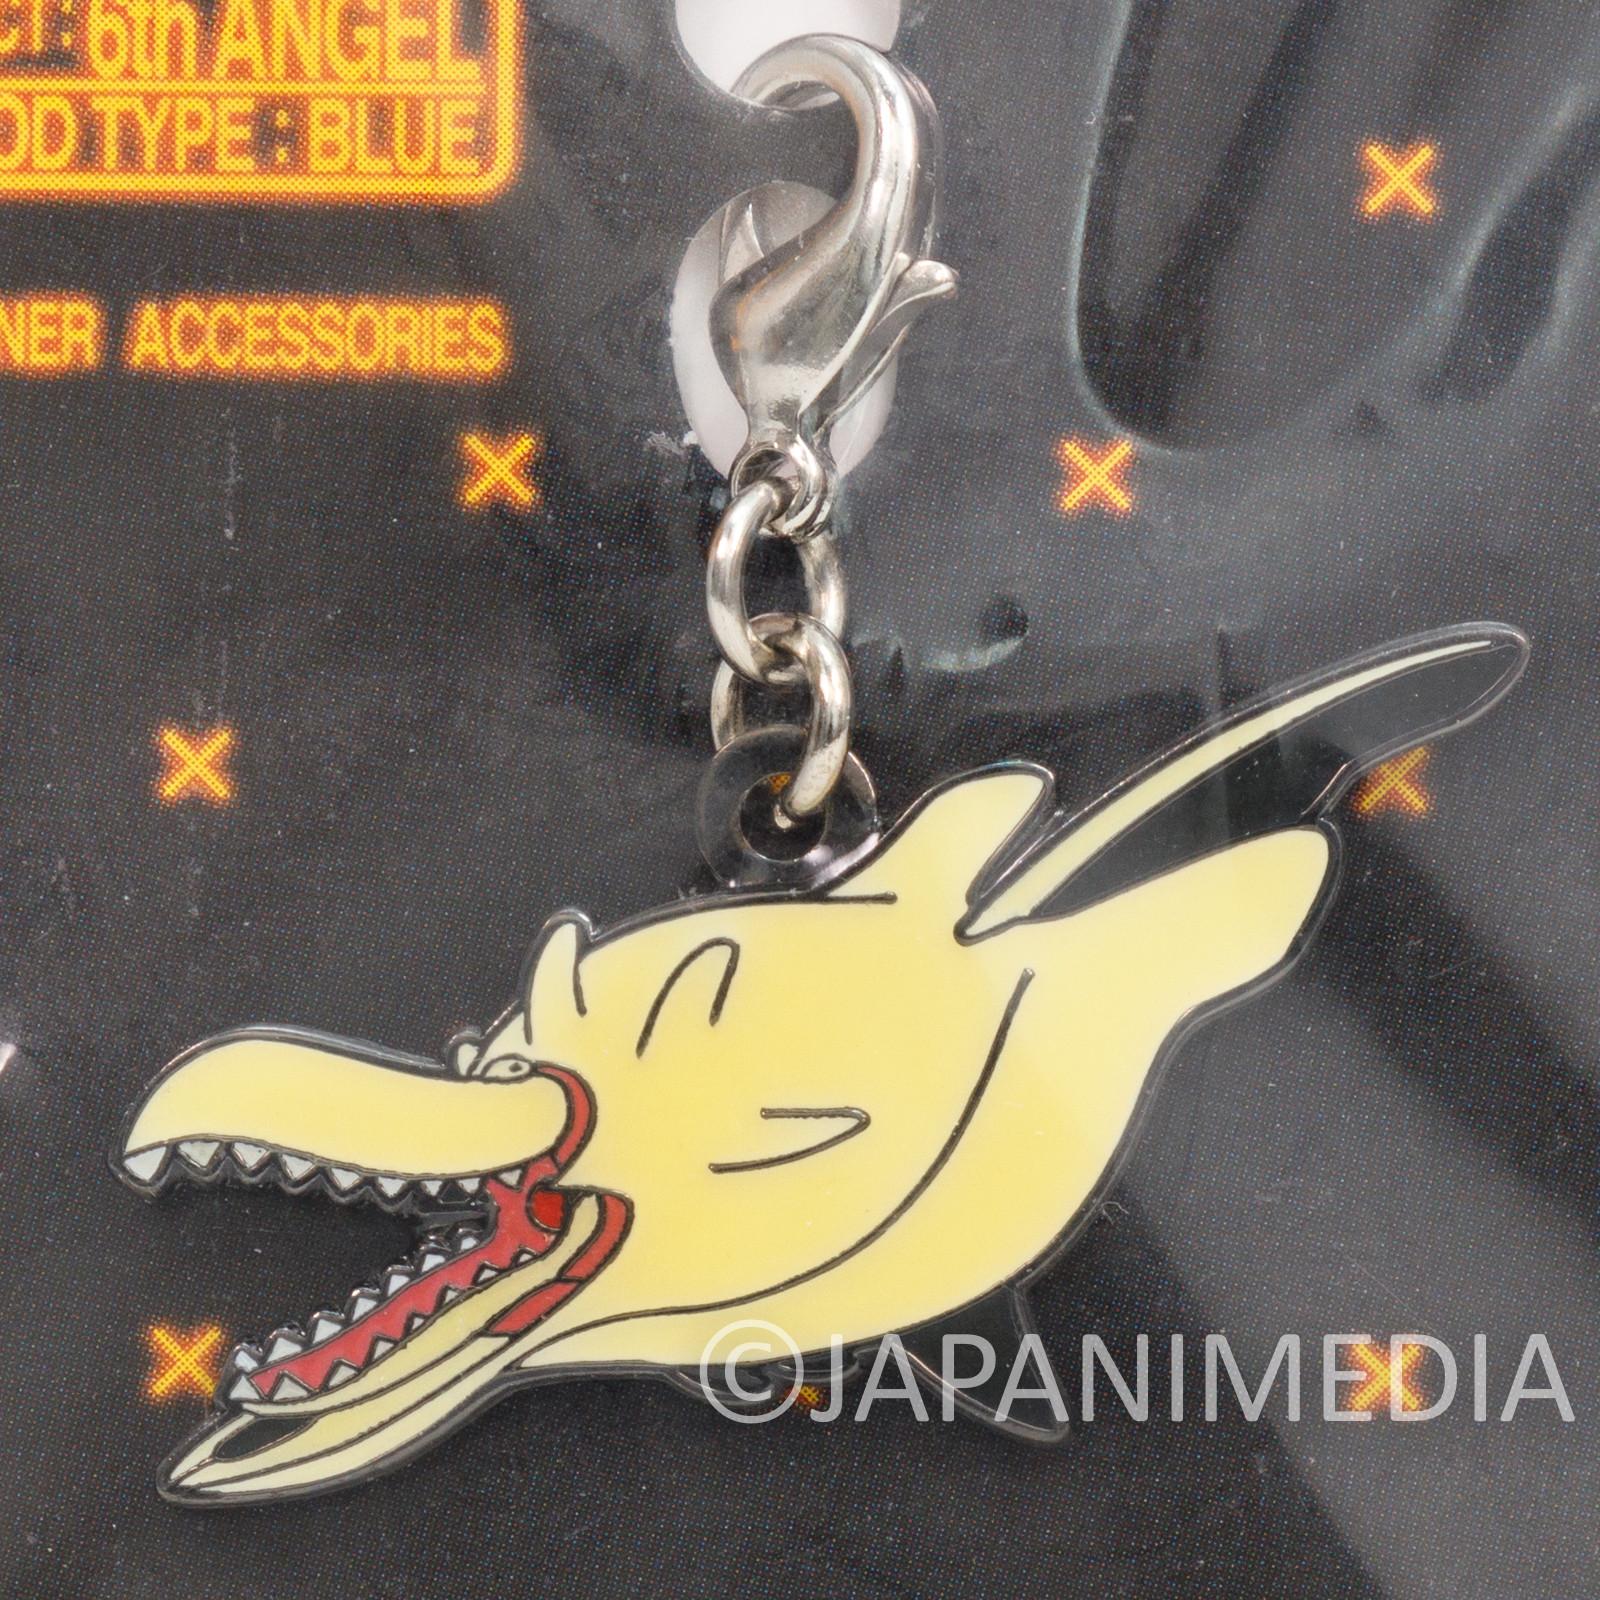 Evangelion 6th Angel Shito Gaghiel Fastener Accessories JAPAN ANIME MANGA